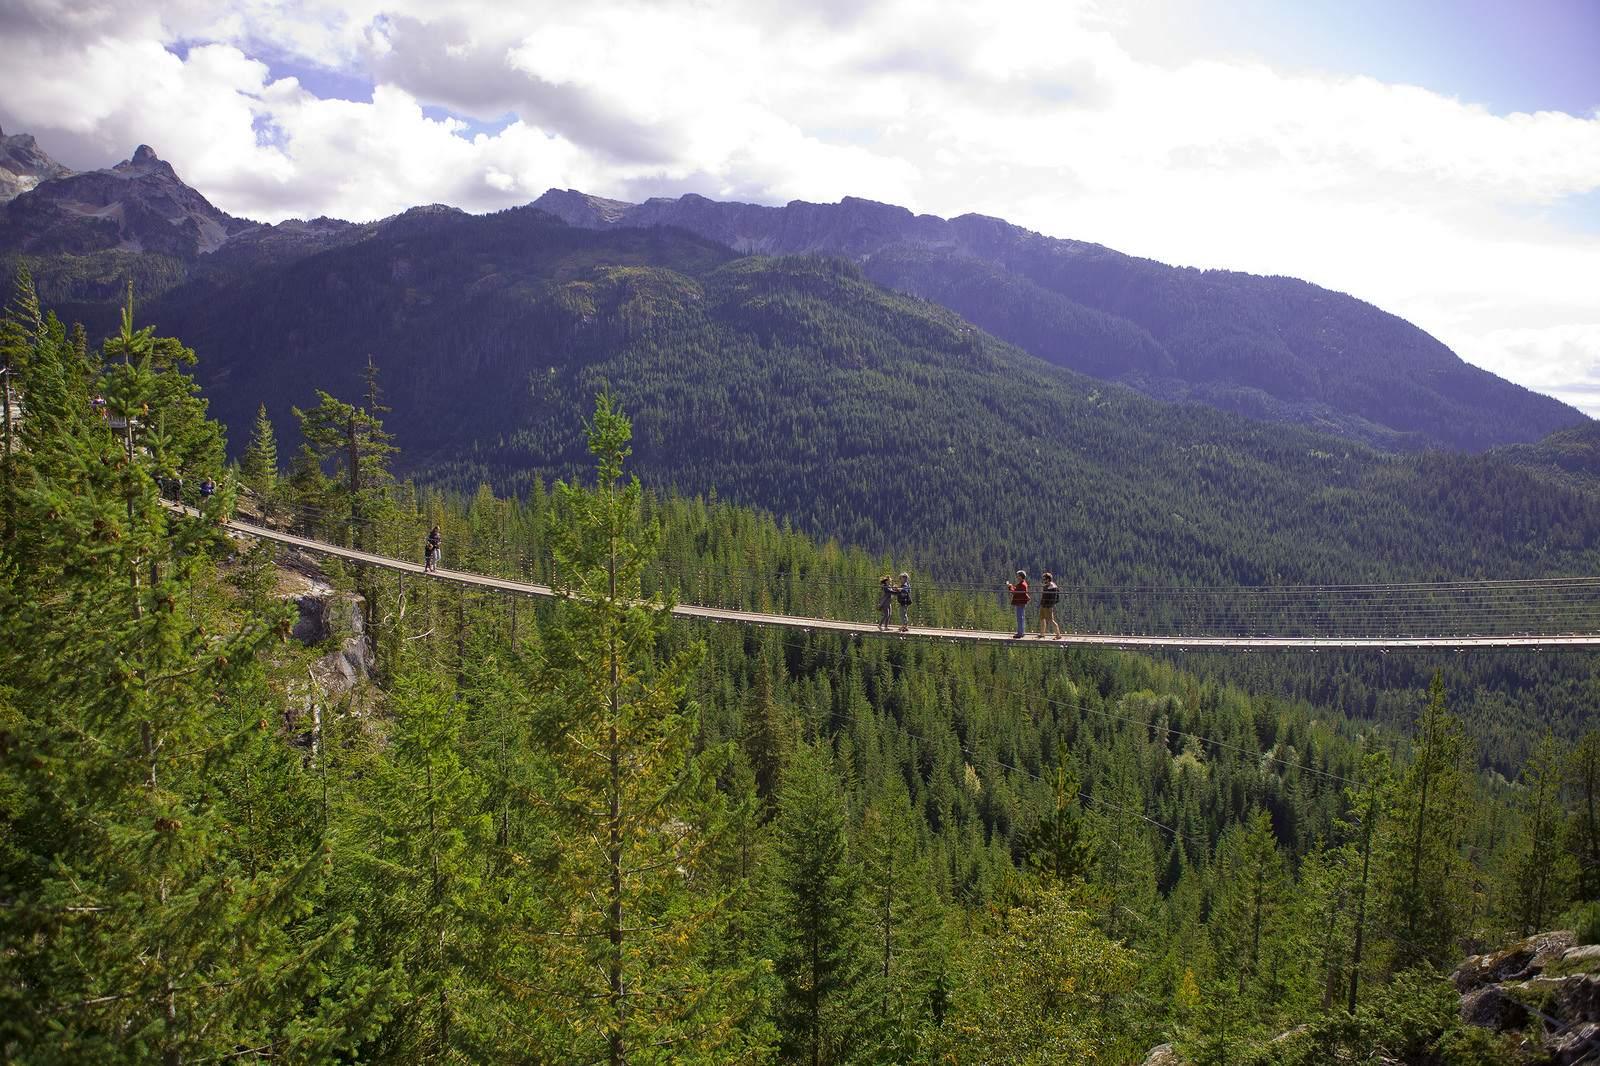 sea to sky gondola6 Sea to Sky Gondola Halfway Between Vancouver and Whistler